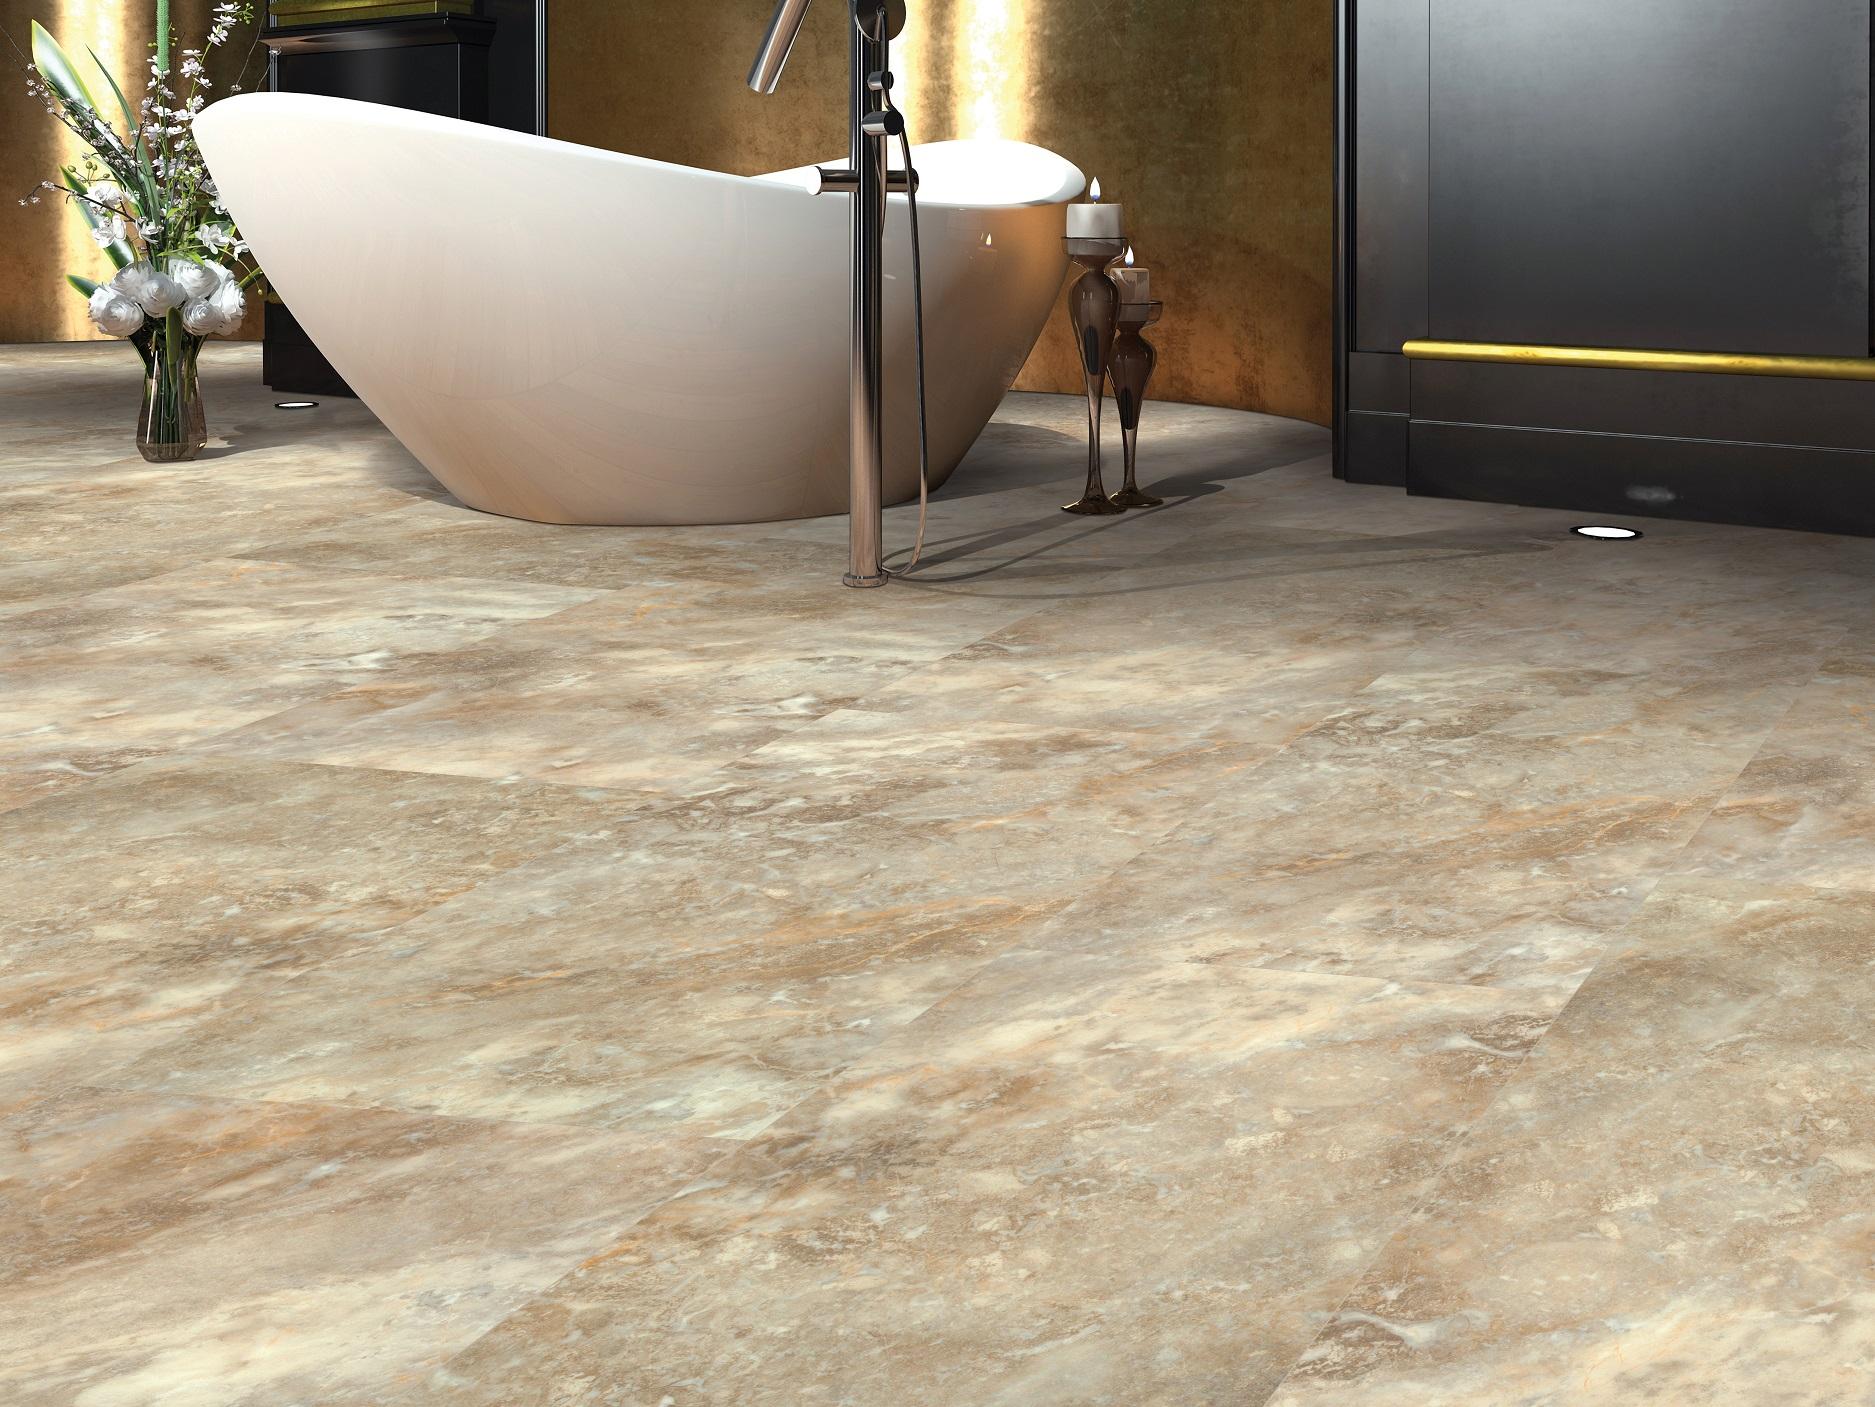 Natural stone look vinyl flooring in a Maple Ridge, BC master bathroom